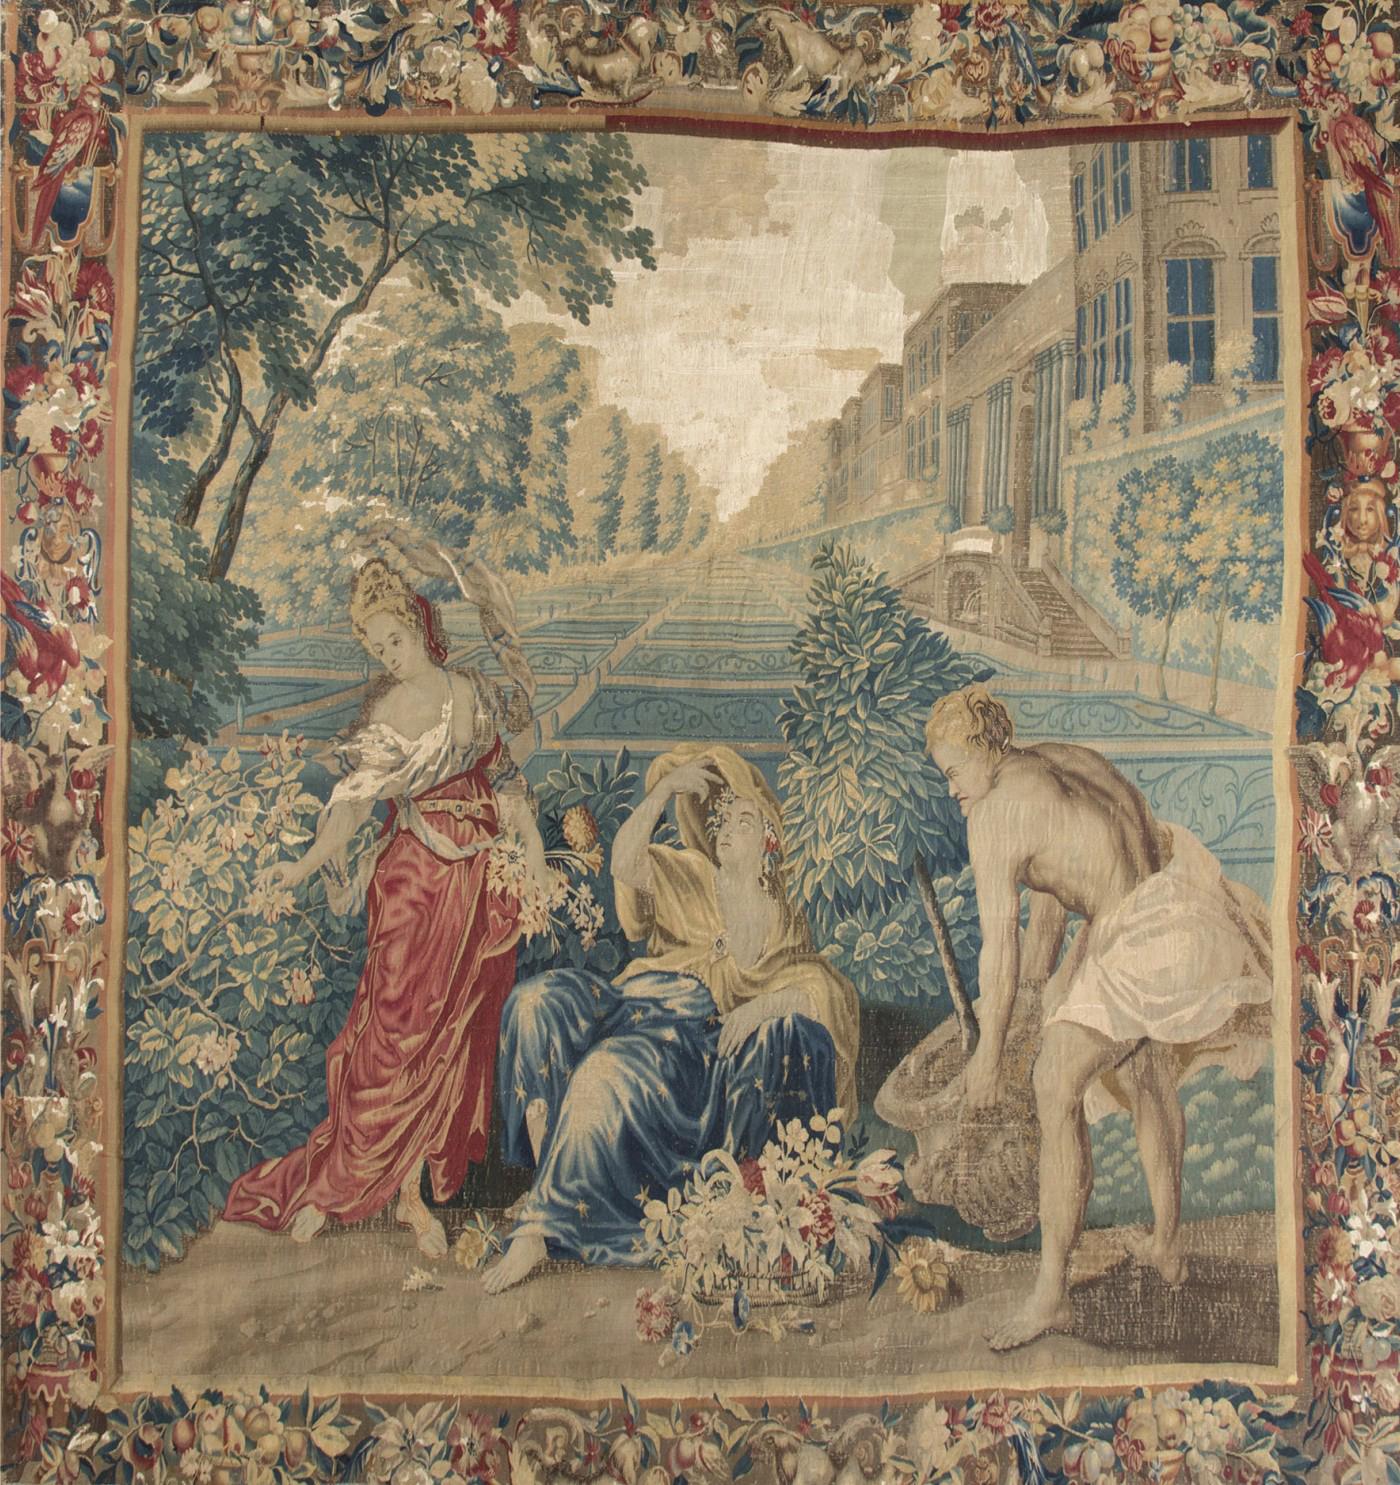 770-tapiz-de-gobelinos-francia-hacia-1710-1720